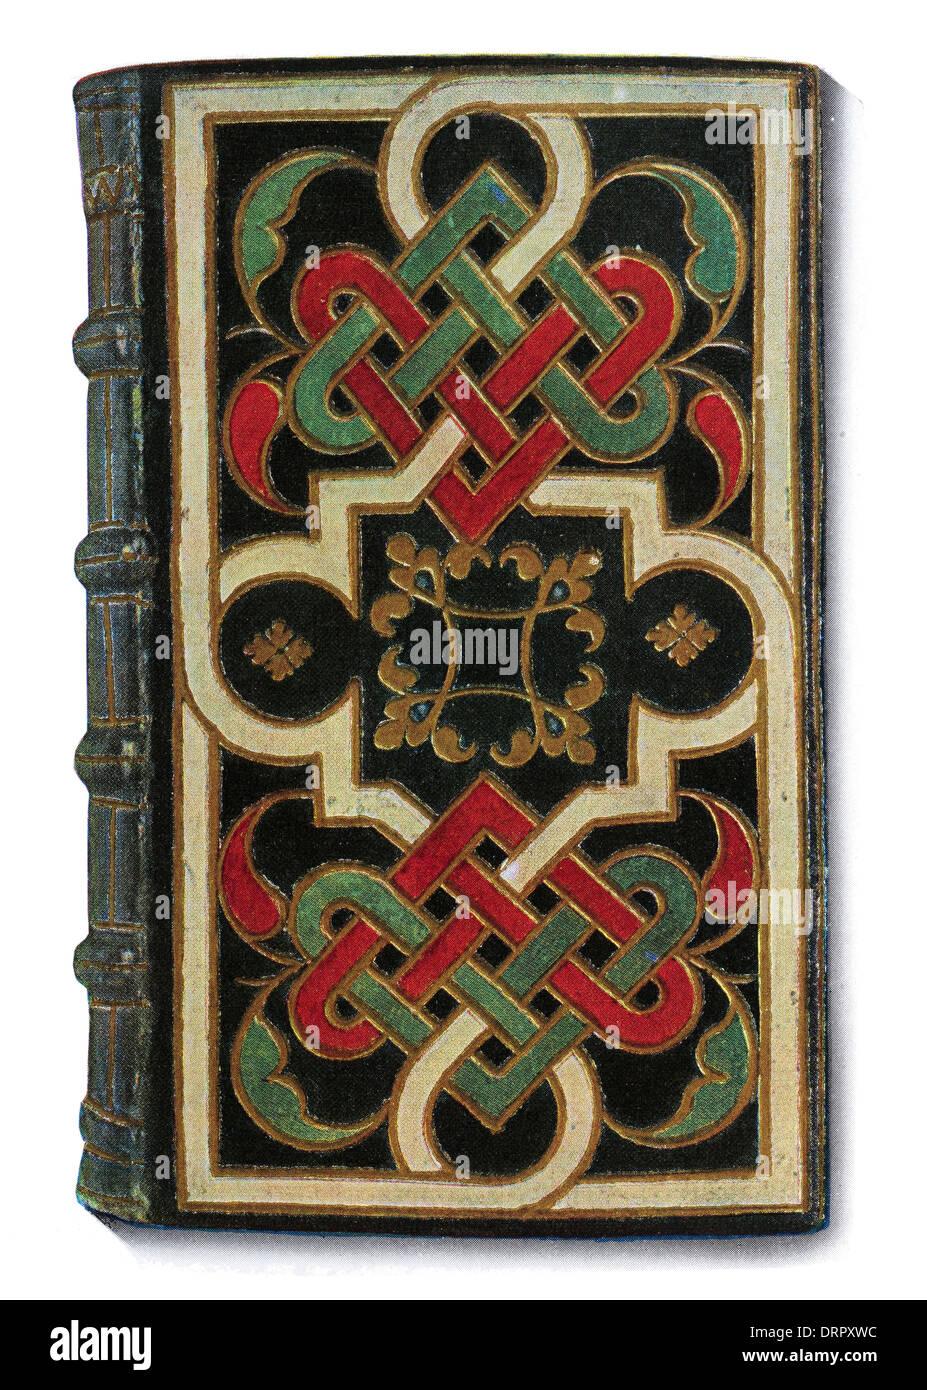 La Lyonnaise de encuadernación de cuero de diseño entrelazado celta portada XVI siglo xvi Imagen De Stock